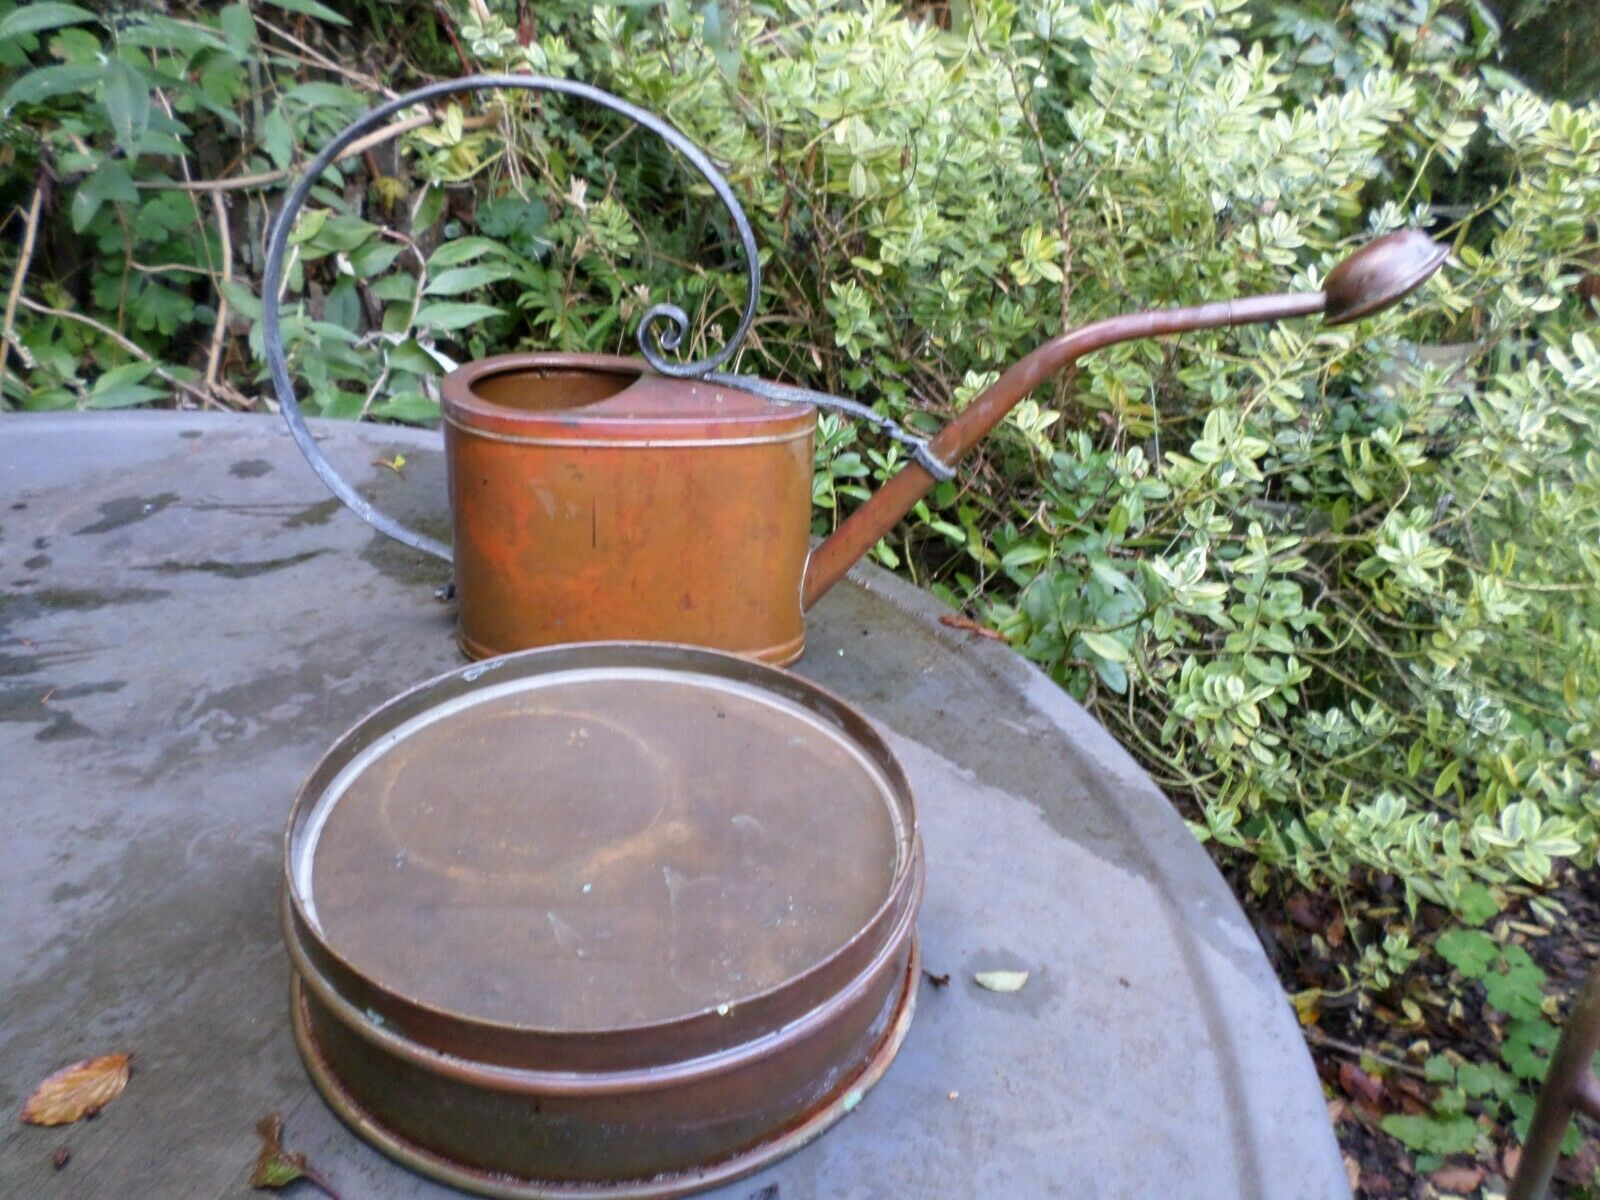 VINTAGE COPPER WATERING CAN & FINE SIEVE OUTDOOR INDOOR GREENHOUSE XMAS GIFT